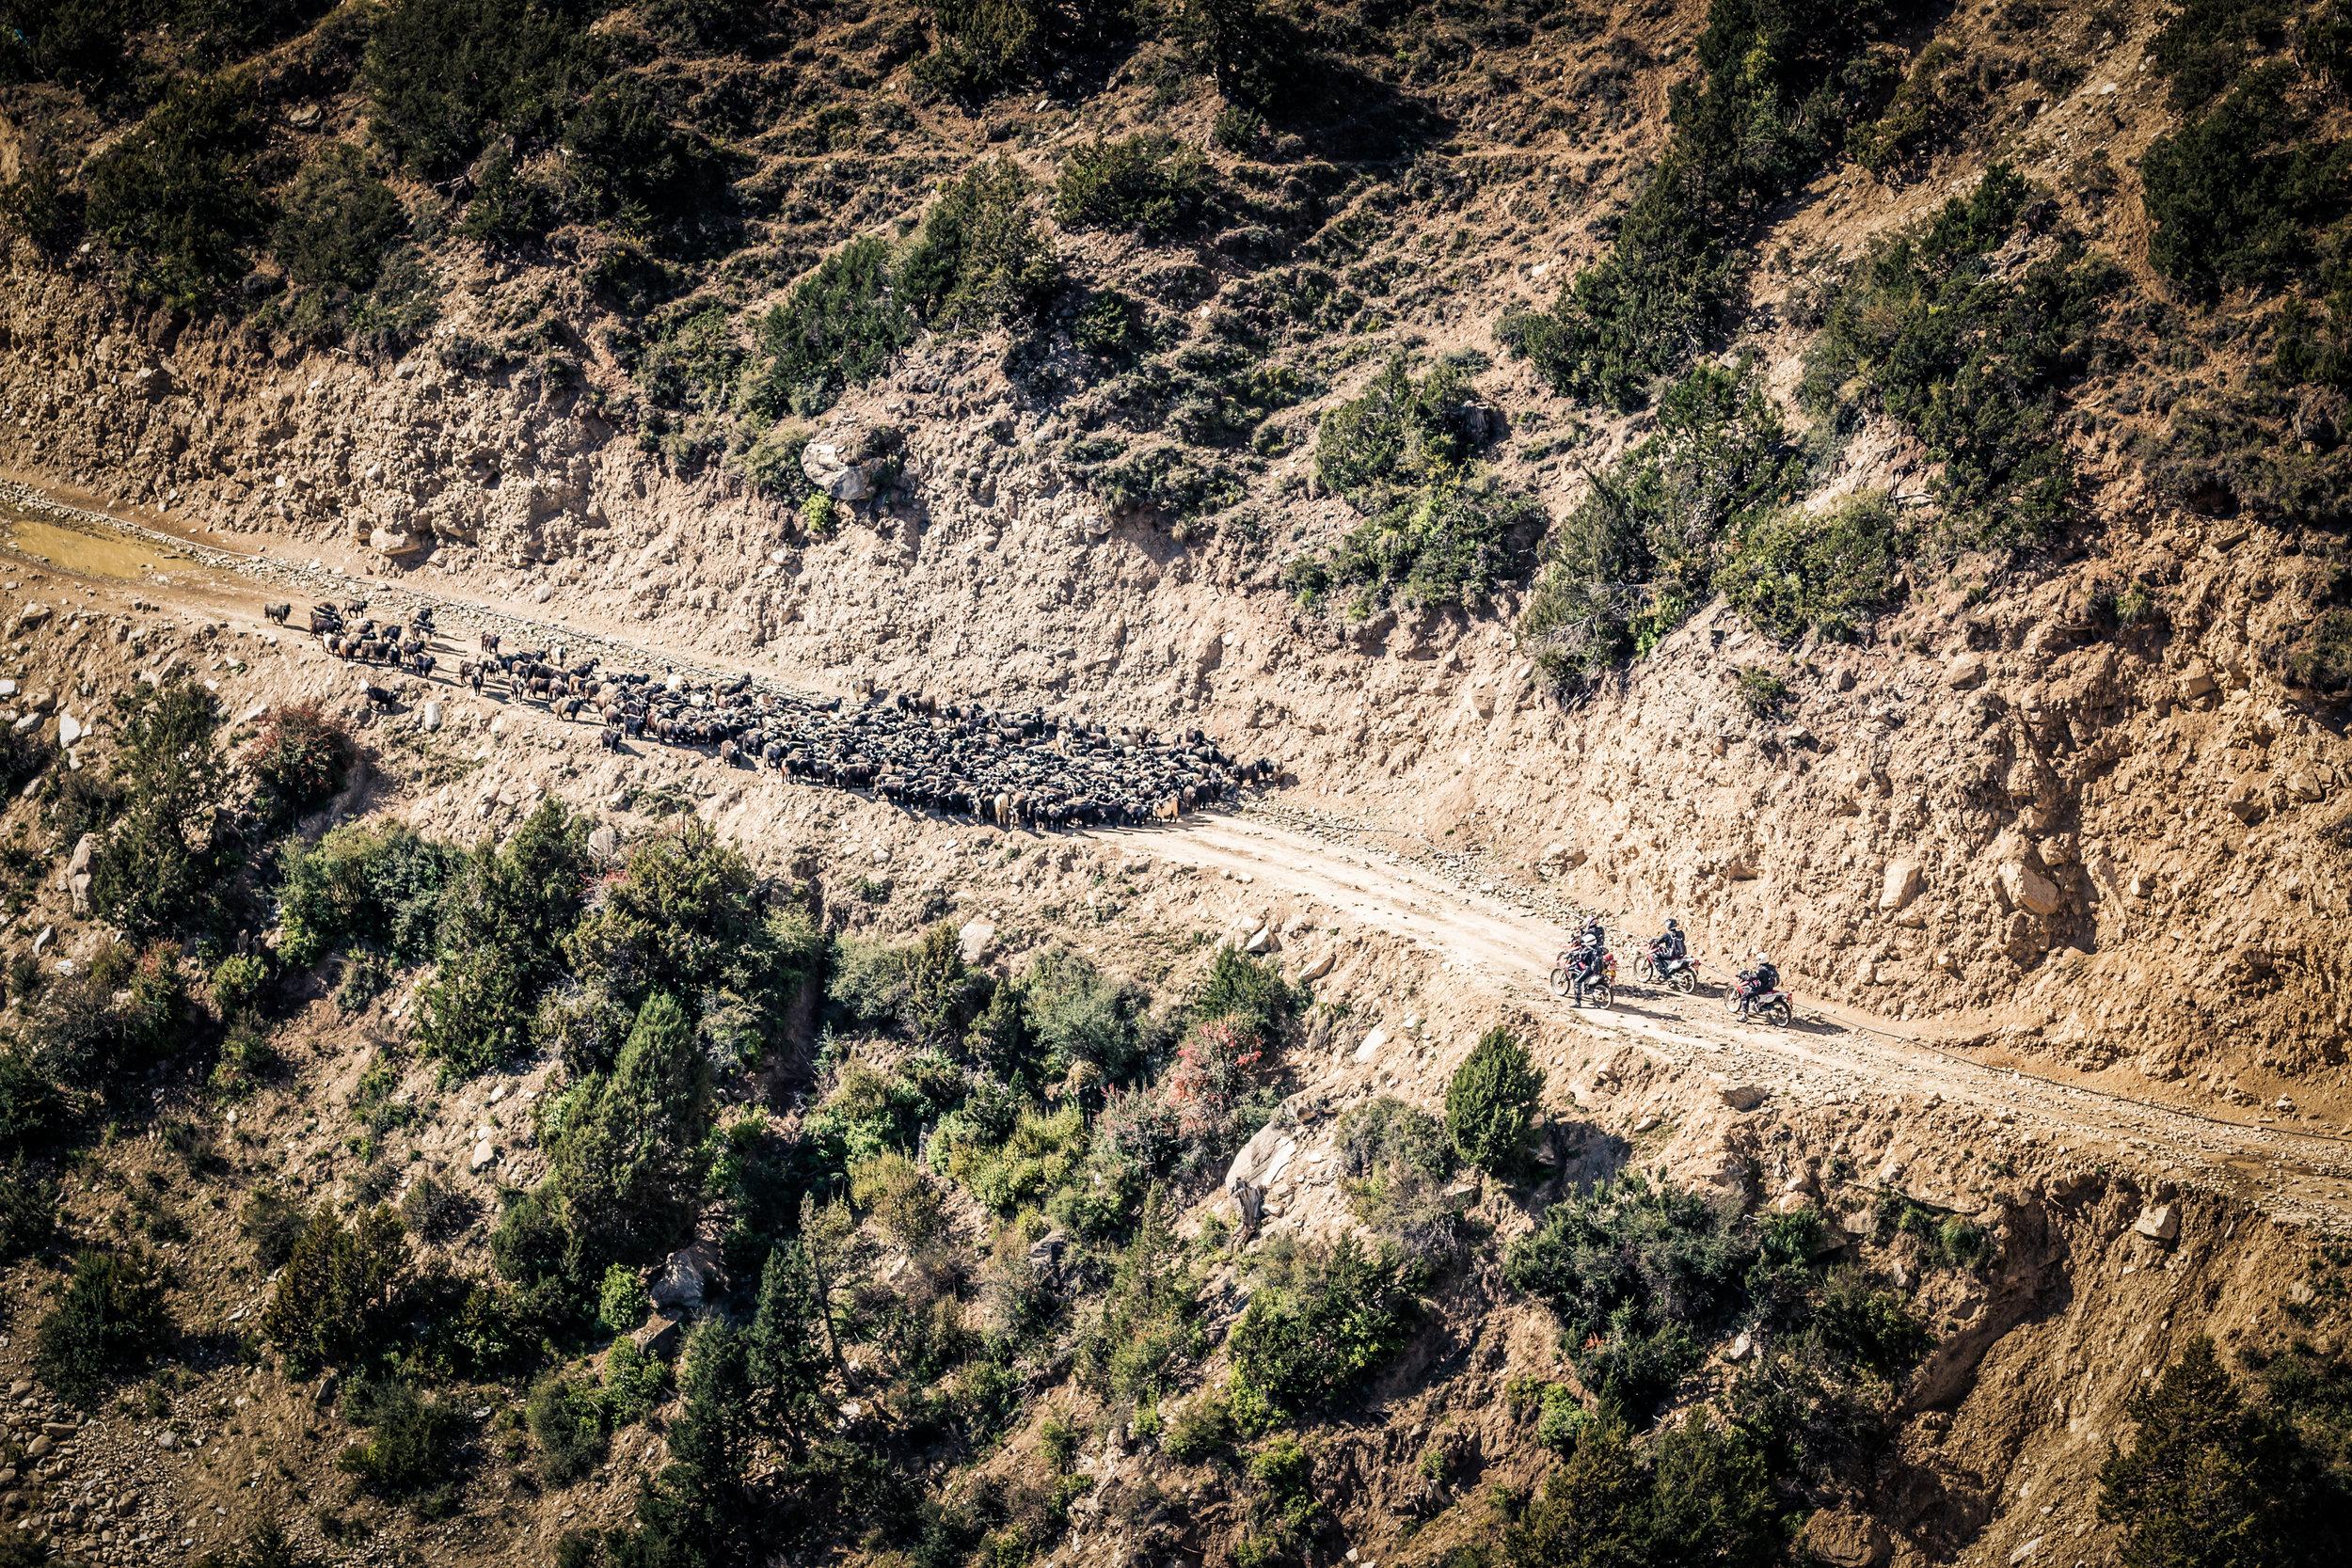 TWHMC-nepal-motorcycle-adventure-2016-0564-2-2.jpg